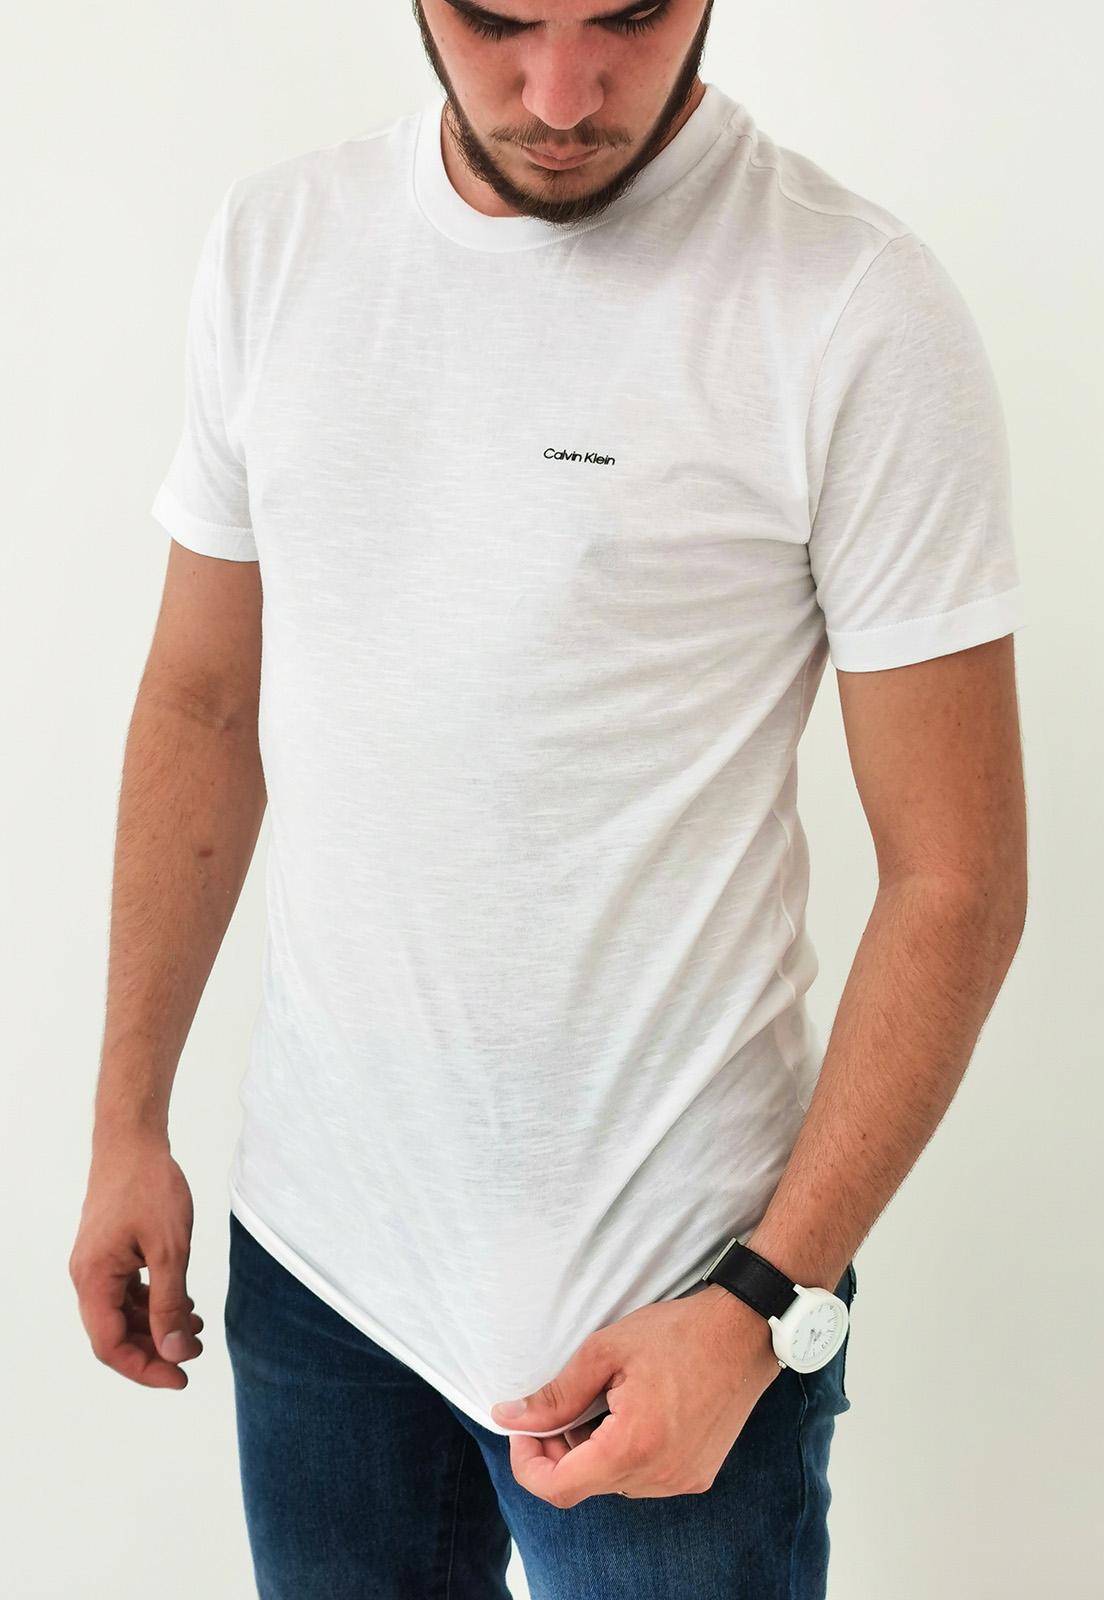 Camiseta Calvin Klein Branco Básica